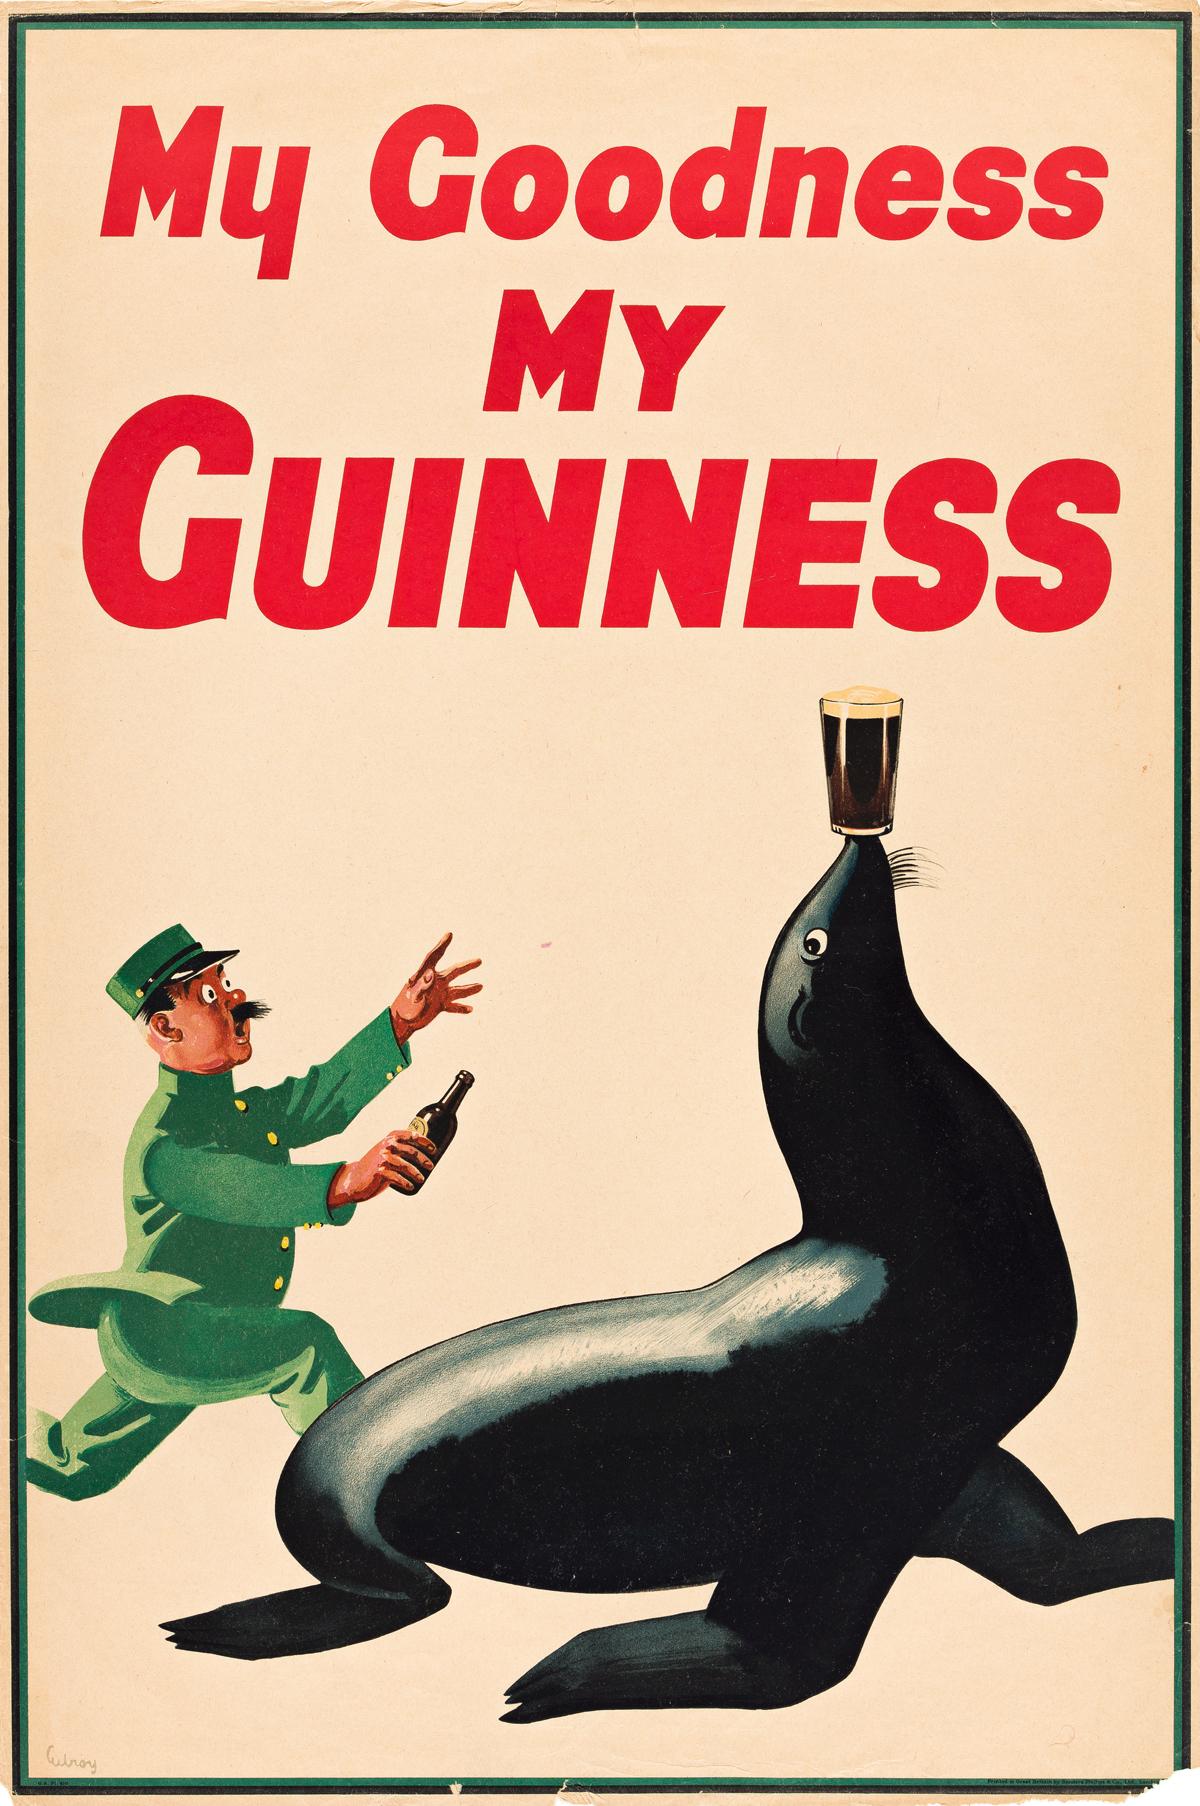 JOHN GILROY (1898-1985).  MY GOODNESS MY GUINNESS. 1935. 29x20 inches, 75x50 cm. Sanders Phillips & Co., Ltd., London.